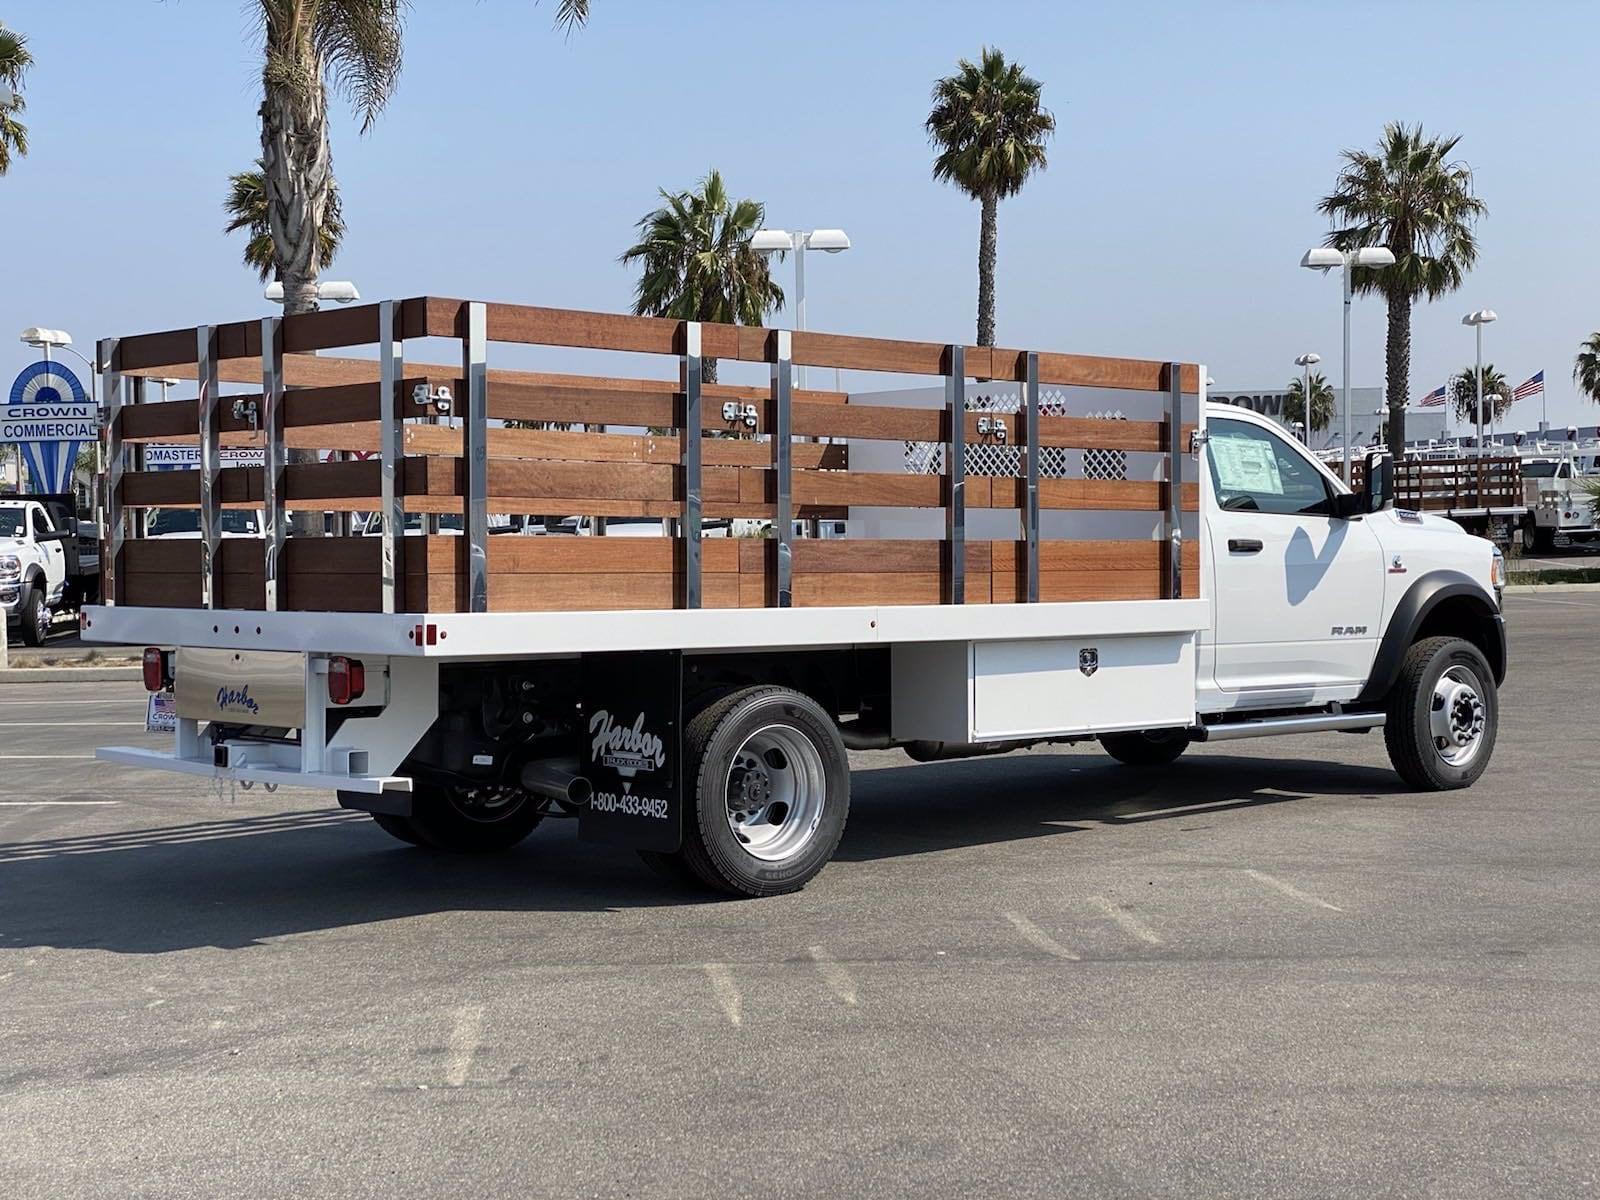 2020 Ram 5500 Regular Cab DRW 4x4, Harbor Stake Bed #H2311 - photo 1